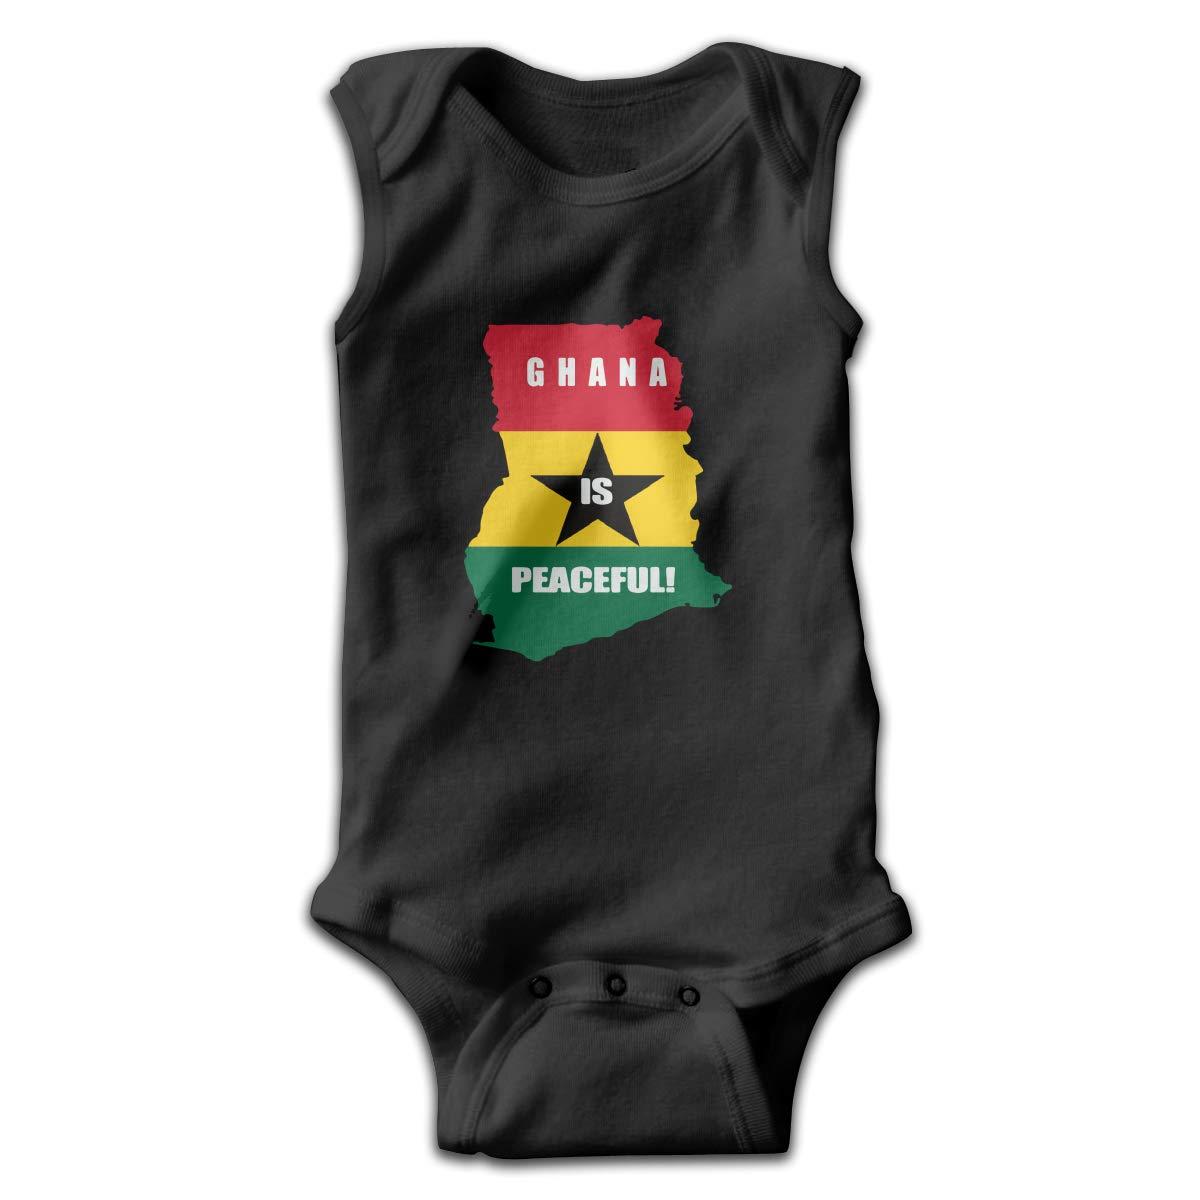 CZDewQ80 Newborn Ghana is Peaceful Sleeveless Baby Clothes Pajamas Sleepwear Suit 0-24 Months